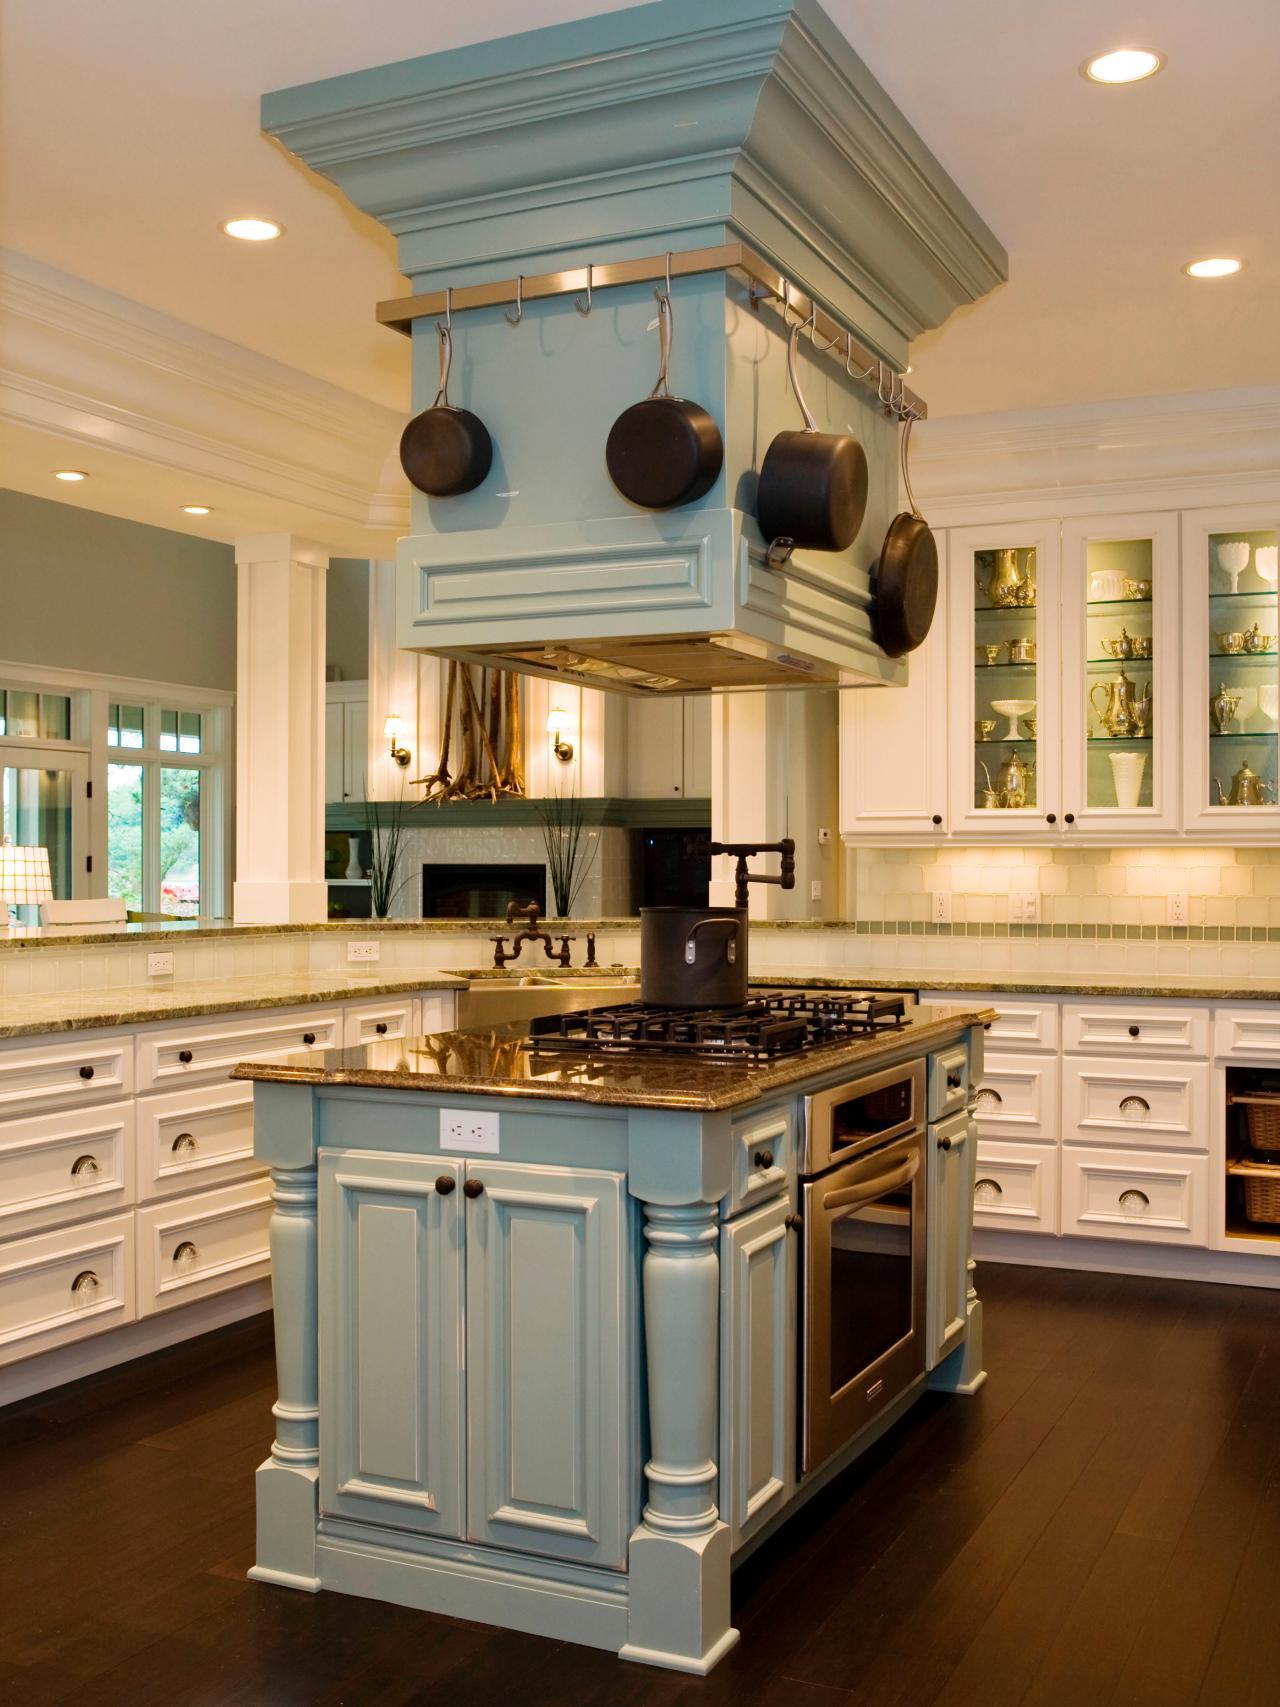 kitchen island design ideas pictures options amp tips hgtv kitchen island design ideas pictures options amp tips hgtv